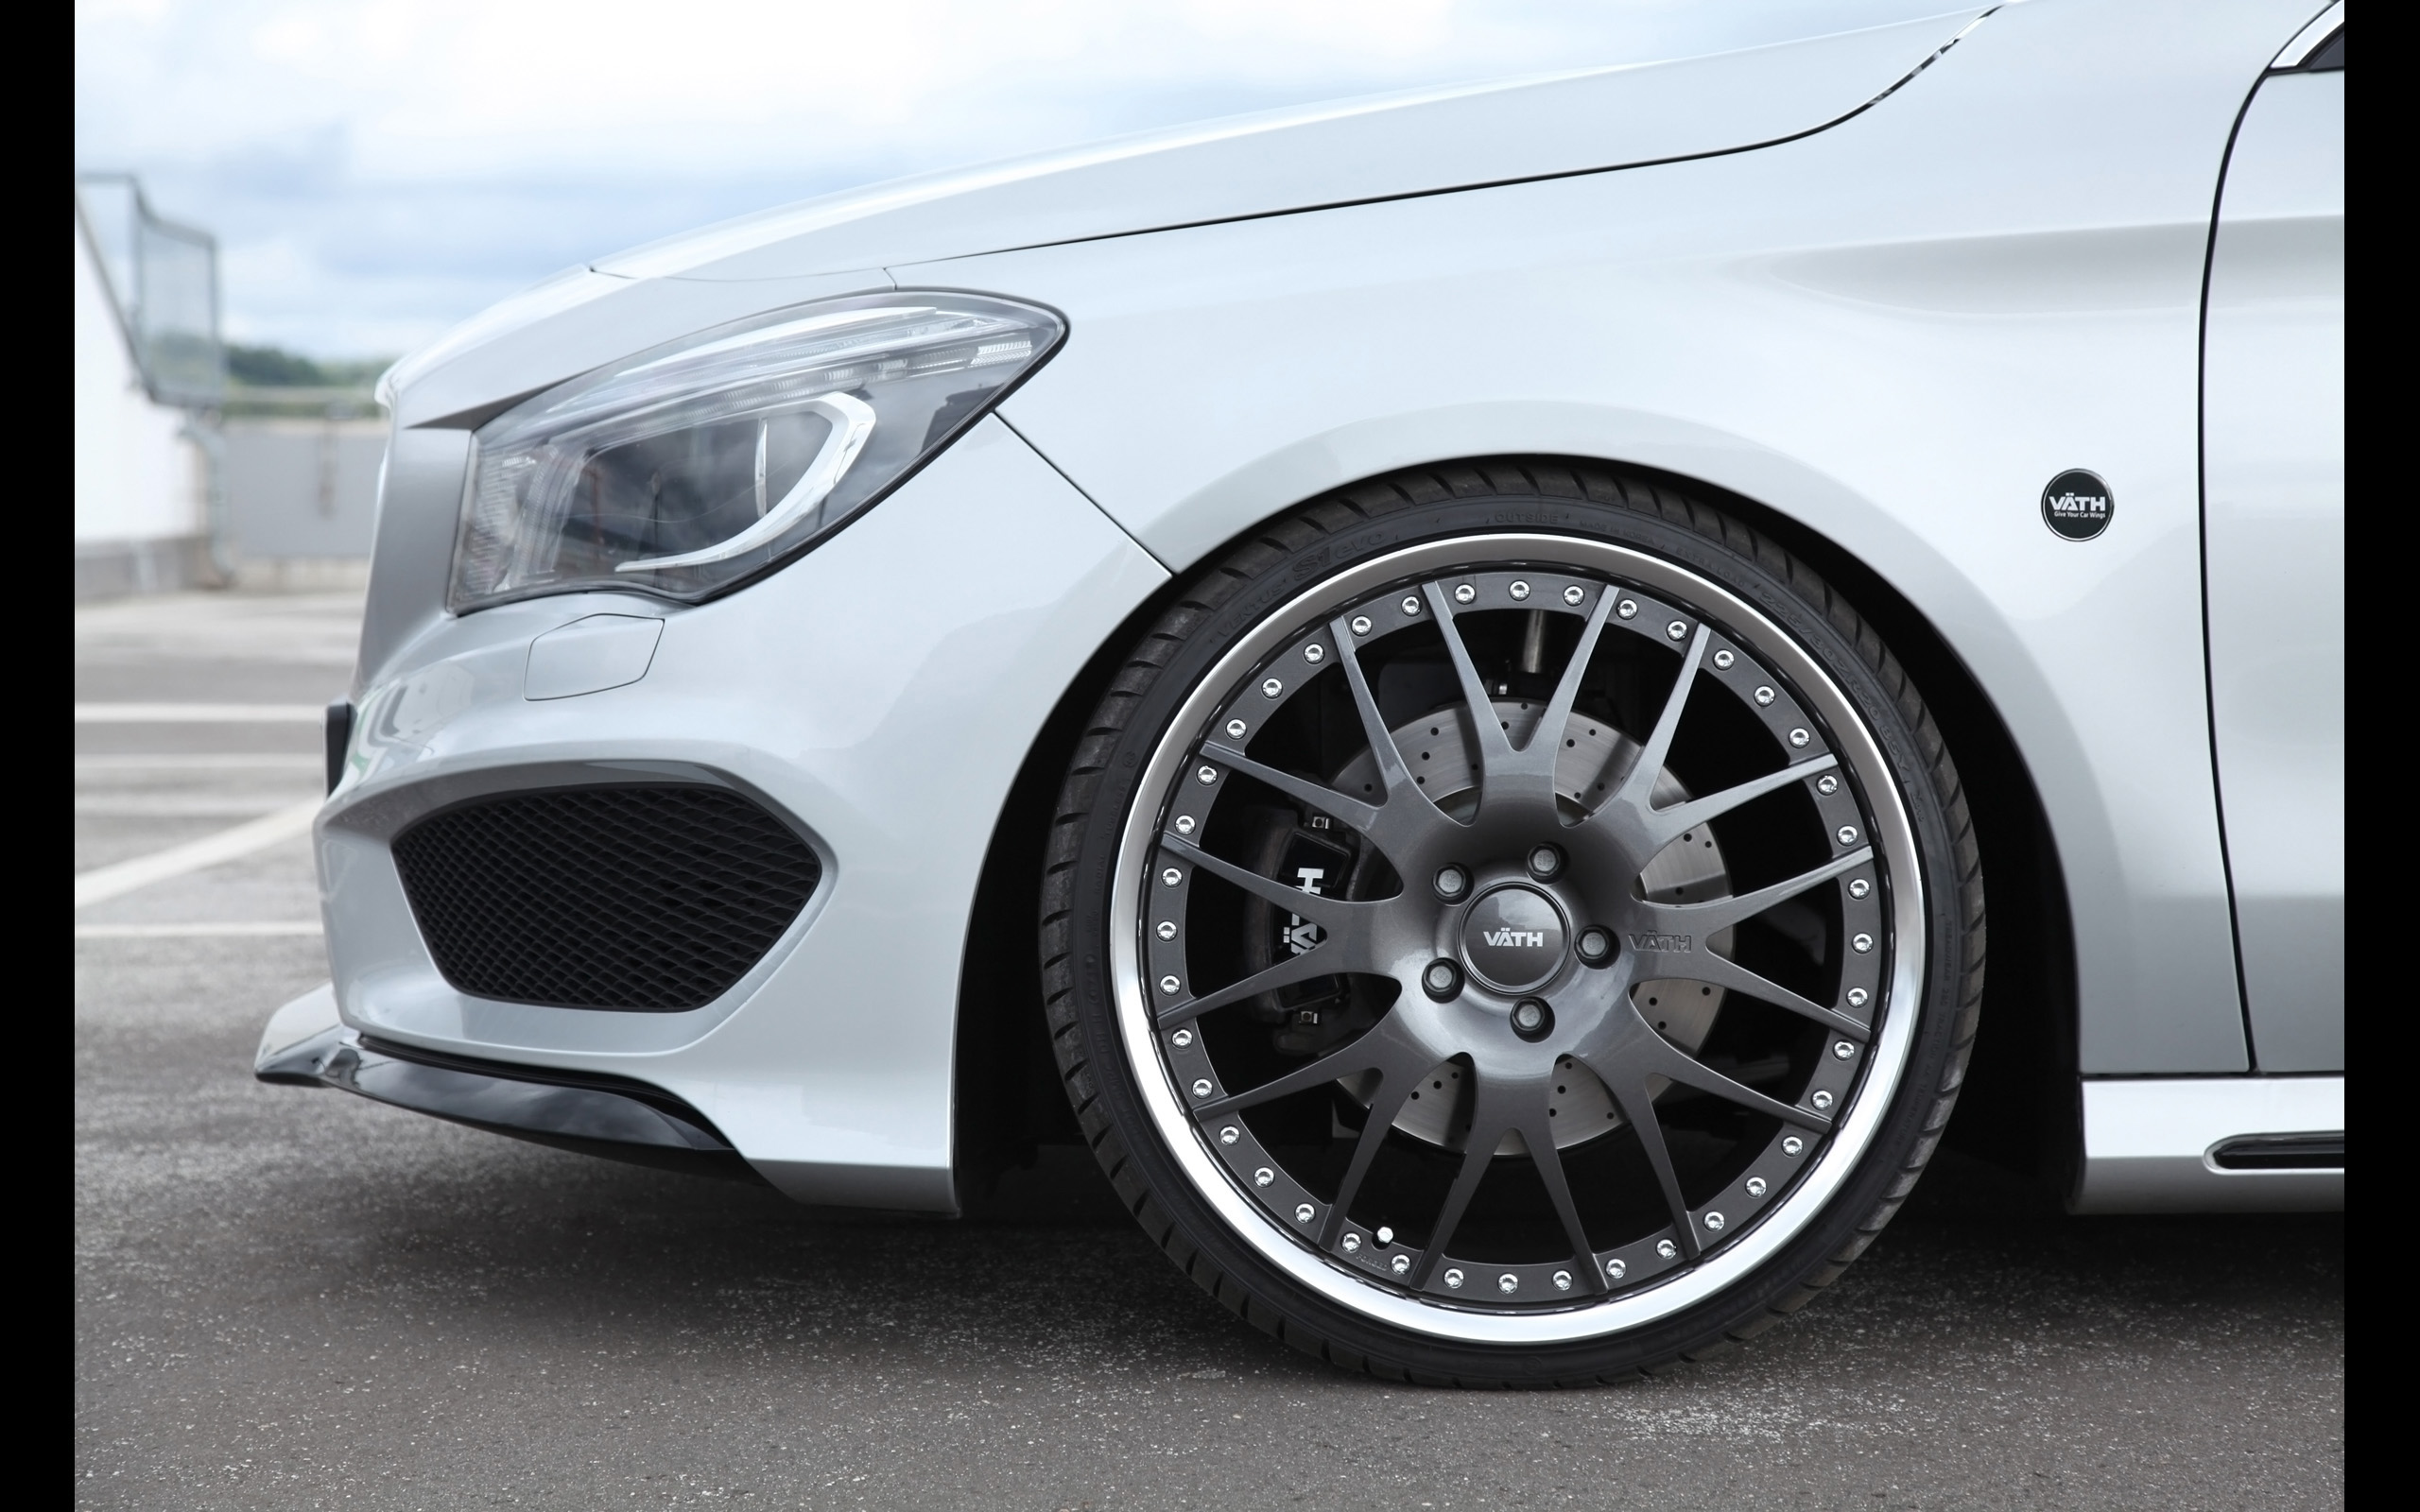 2013_Vath_Mercedes_Benz_CLA_V25_tuning_wheel_2560x1600.jpg